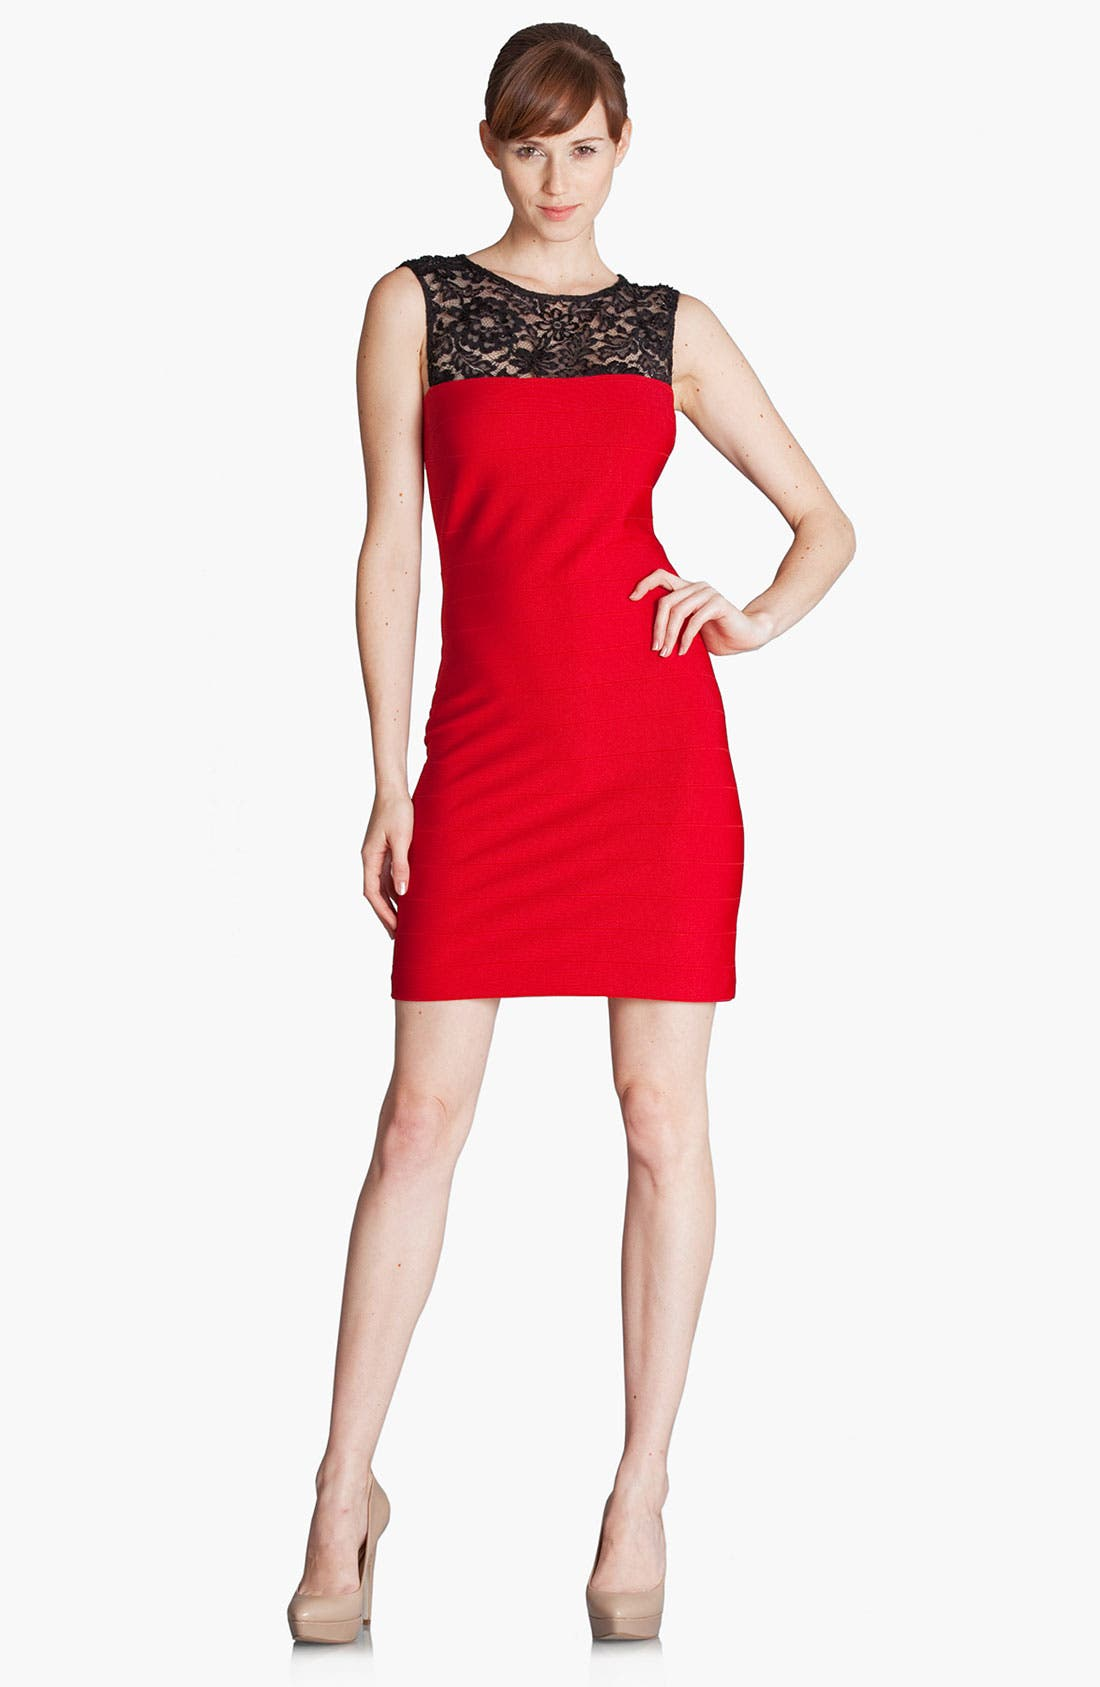 Alternate Image 1 Selected - JS Boutique Lace Yoke Banded Jersey Sheath Dress (Petite)